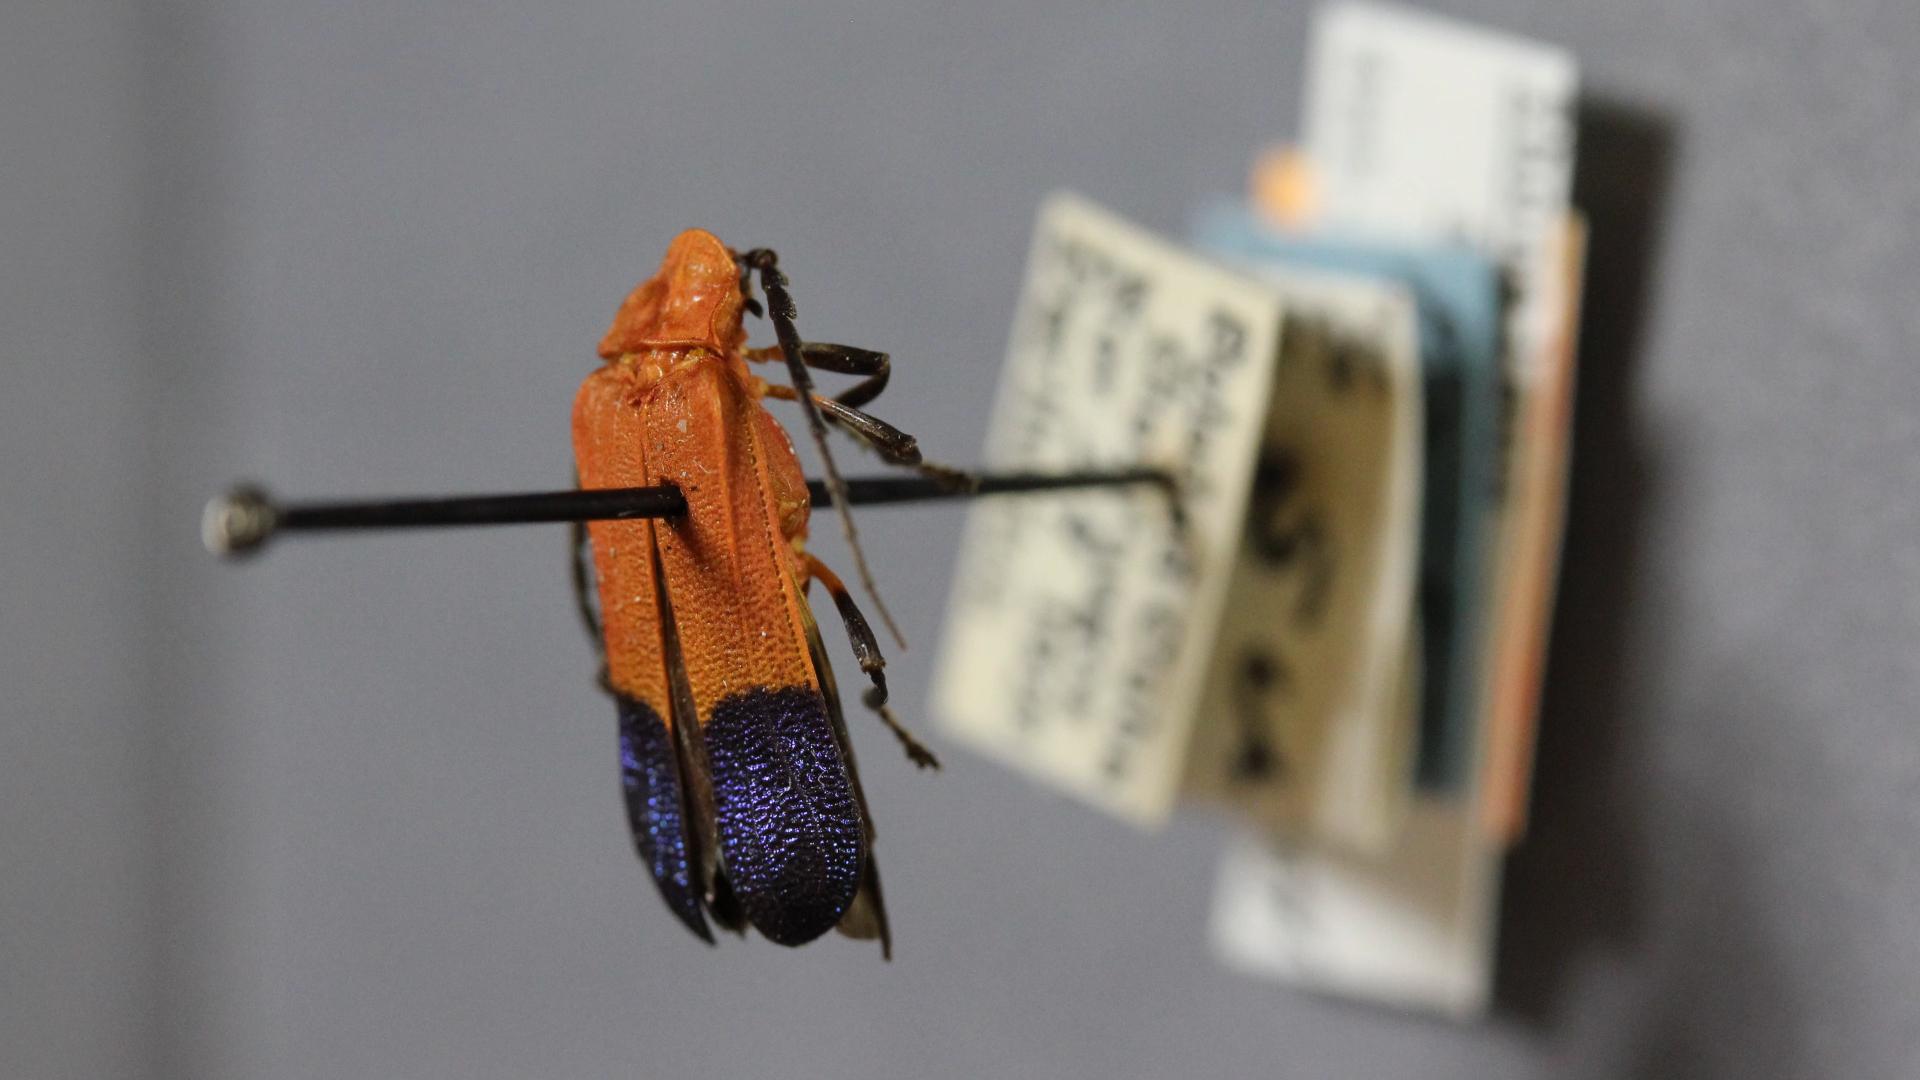 Beetle Bluffs full_beetle on pin.jpg